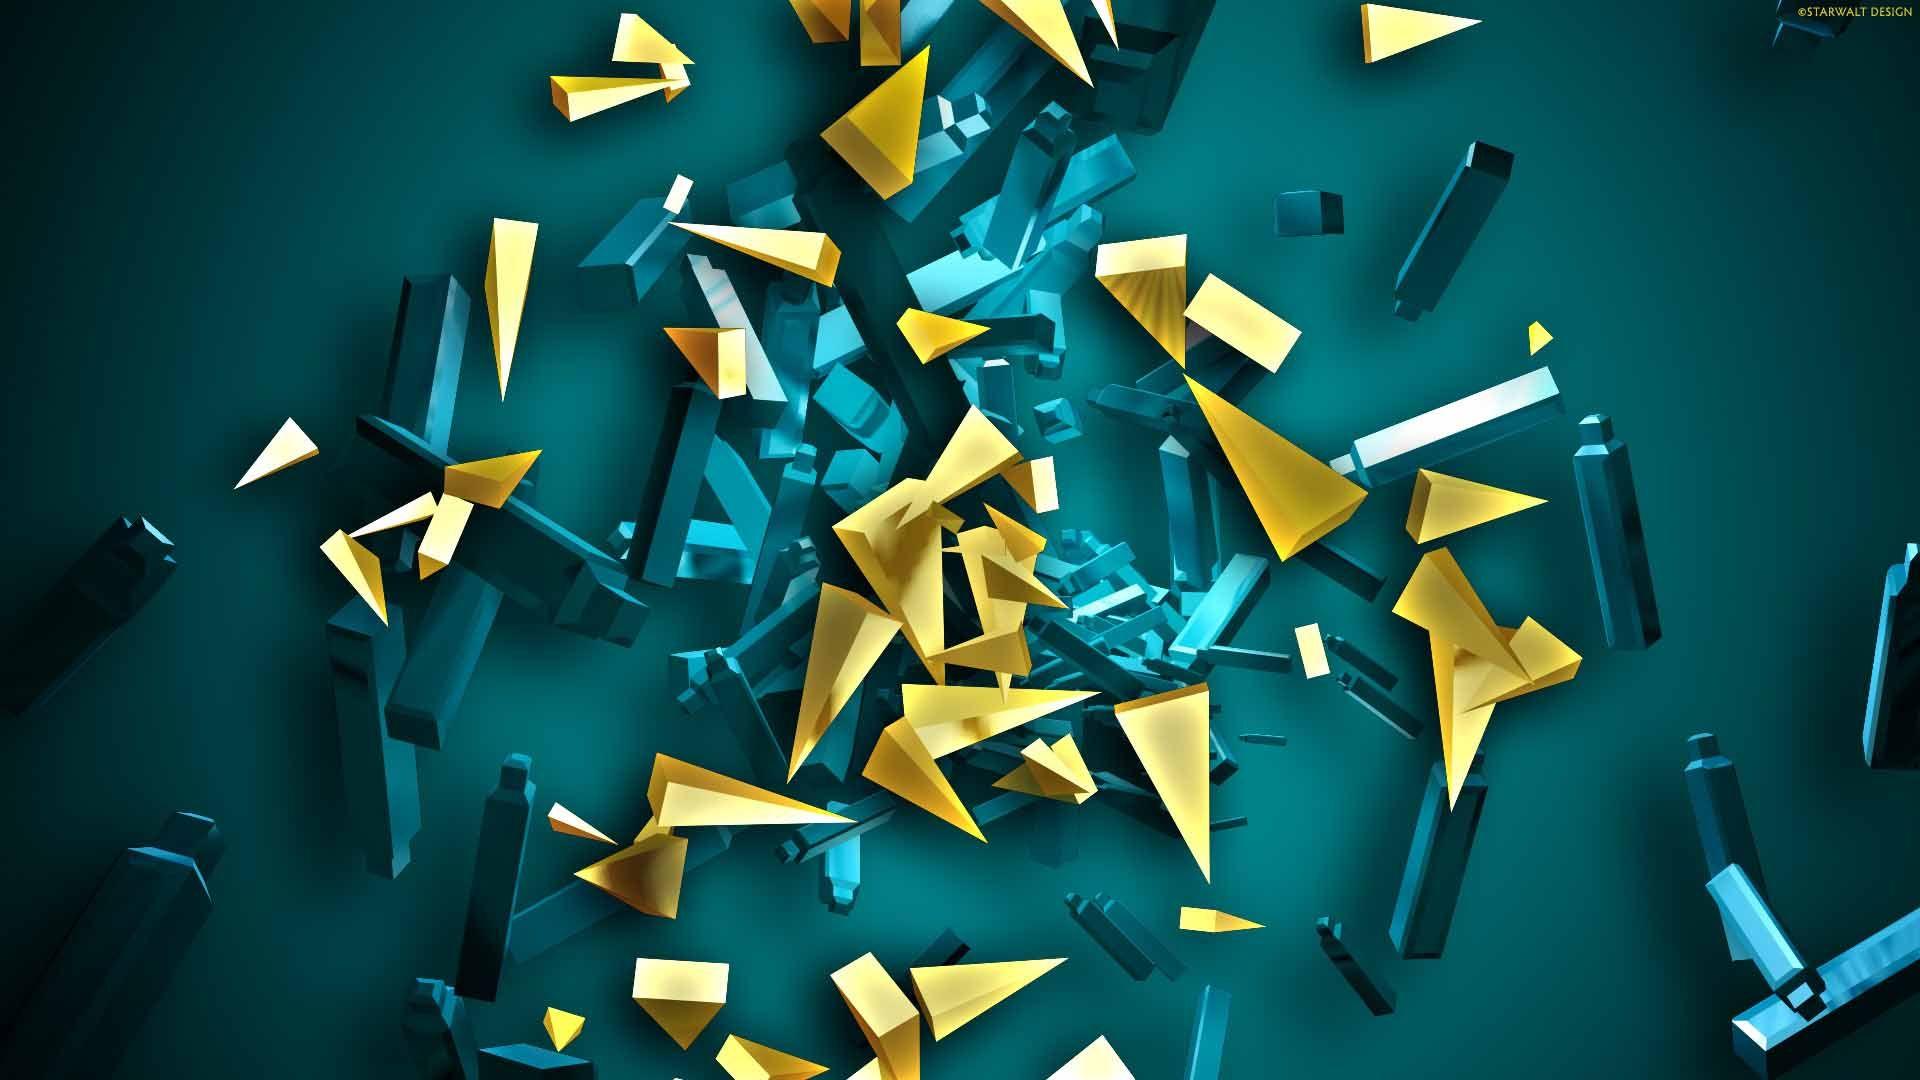 3D Abstract Blue Yellow Backgrounds Wallpapers HD Desktop